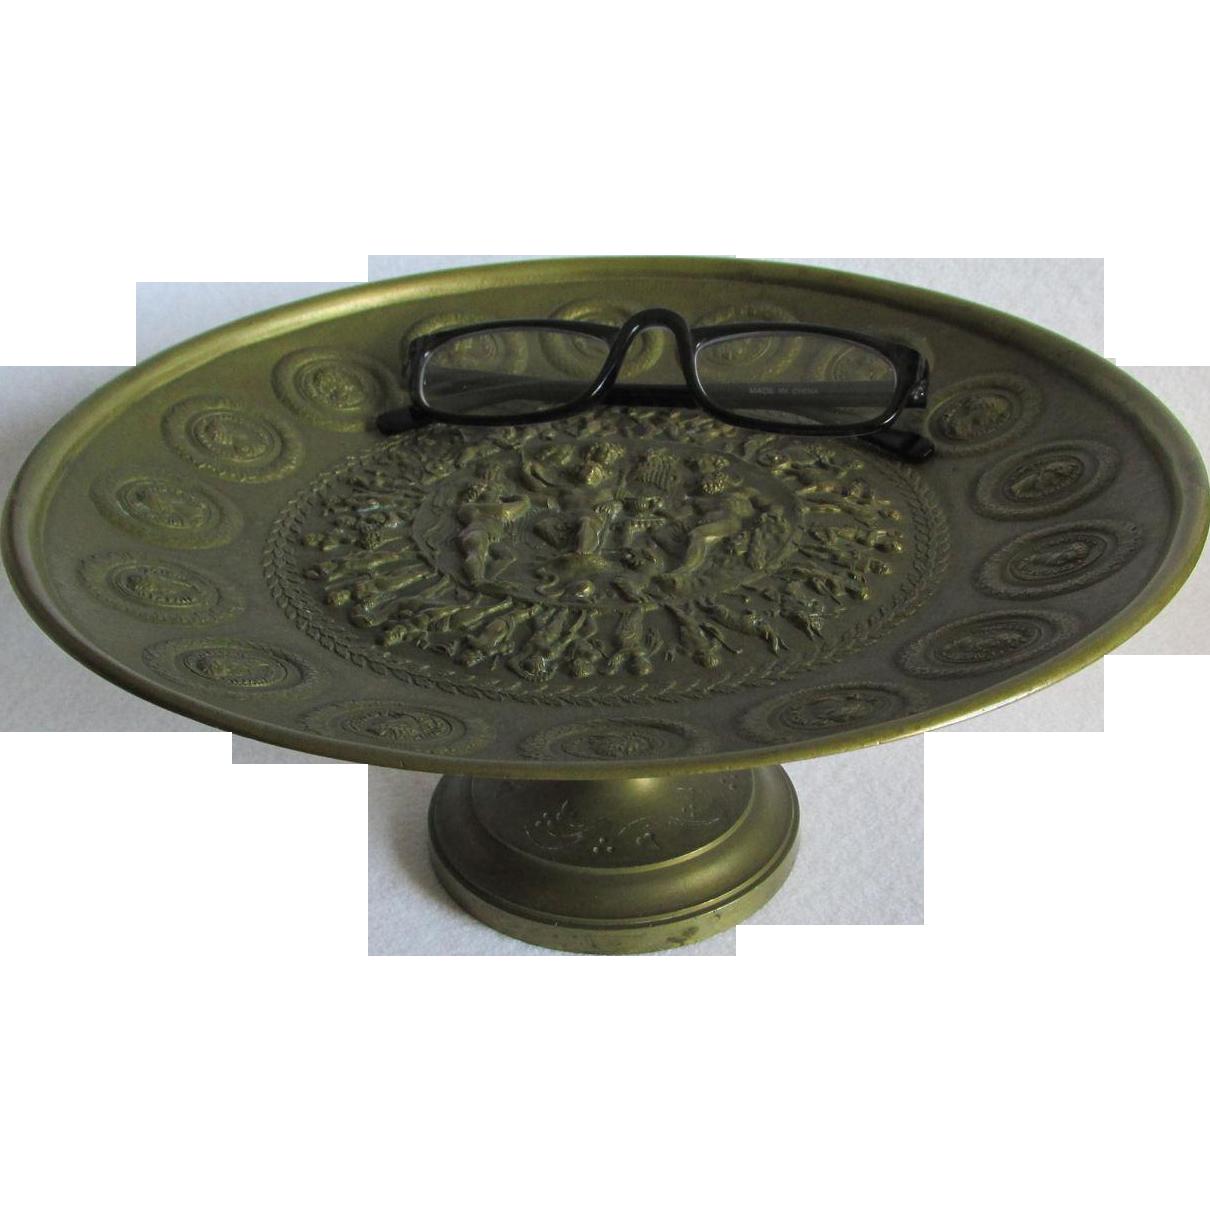 19thC Bronze Comport, Calling Card Receiver Mythology Motif